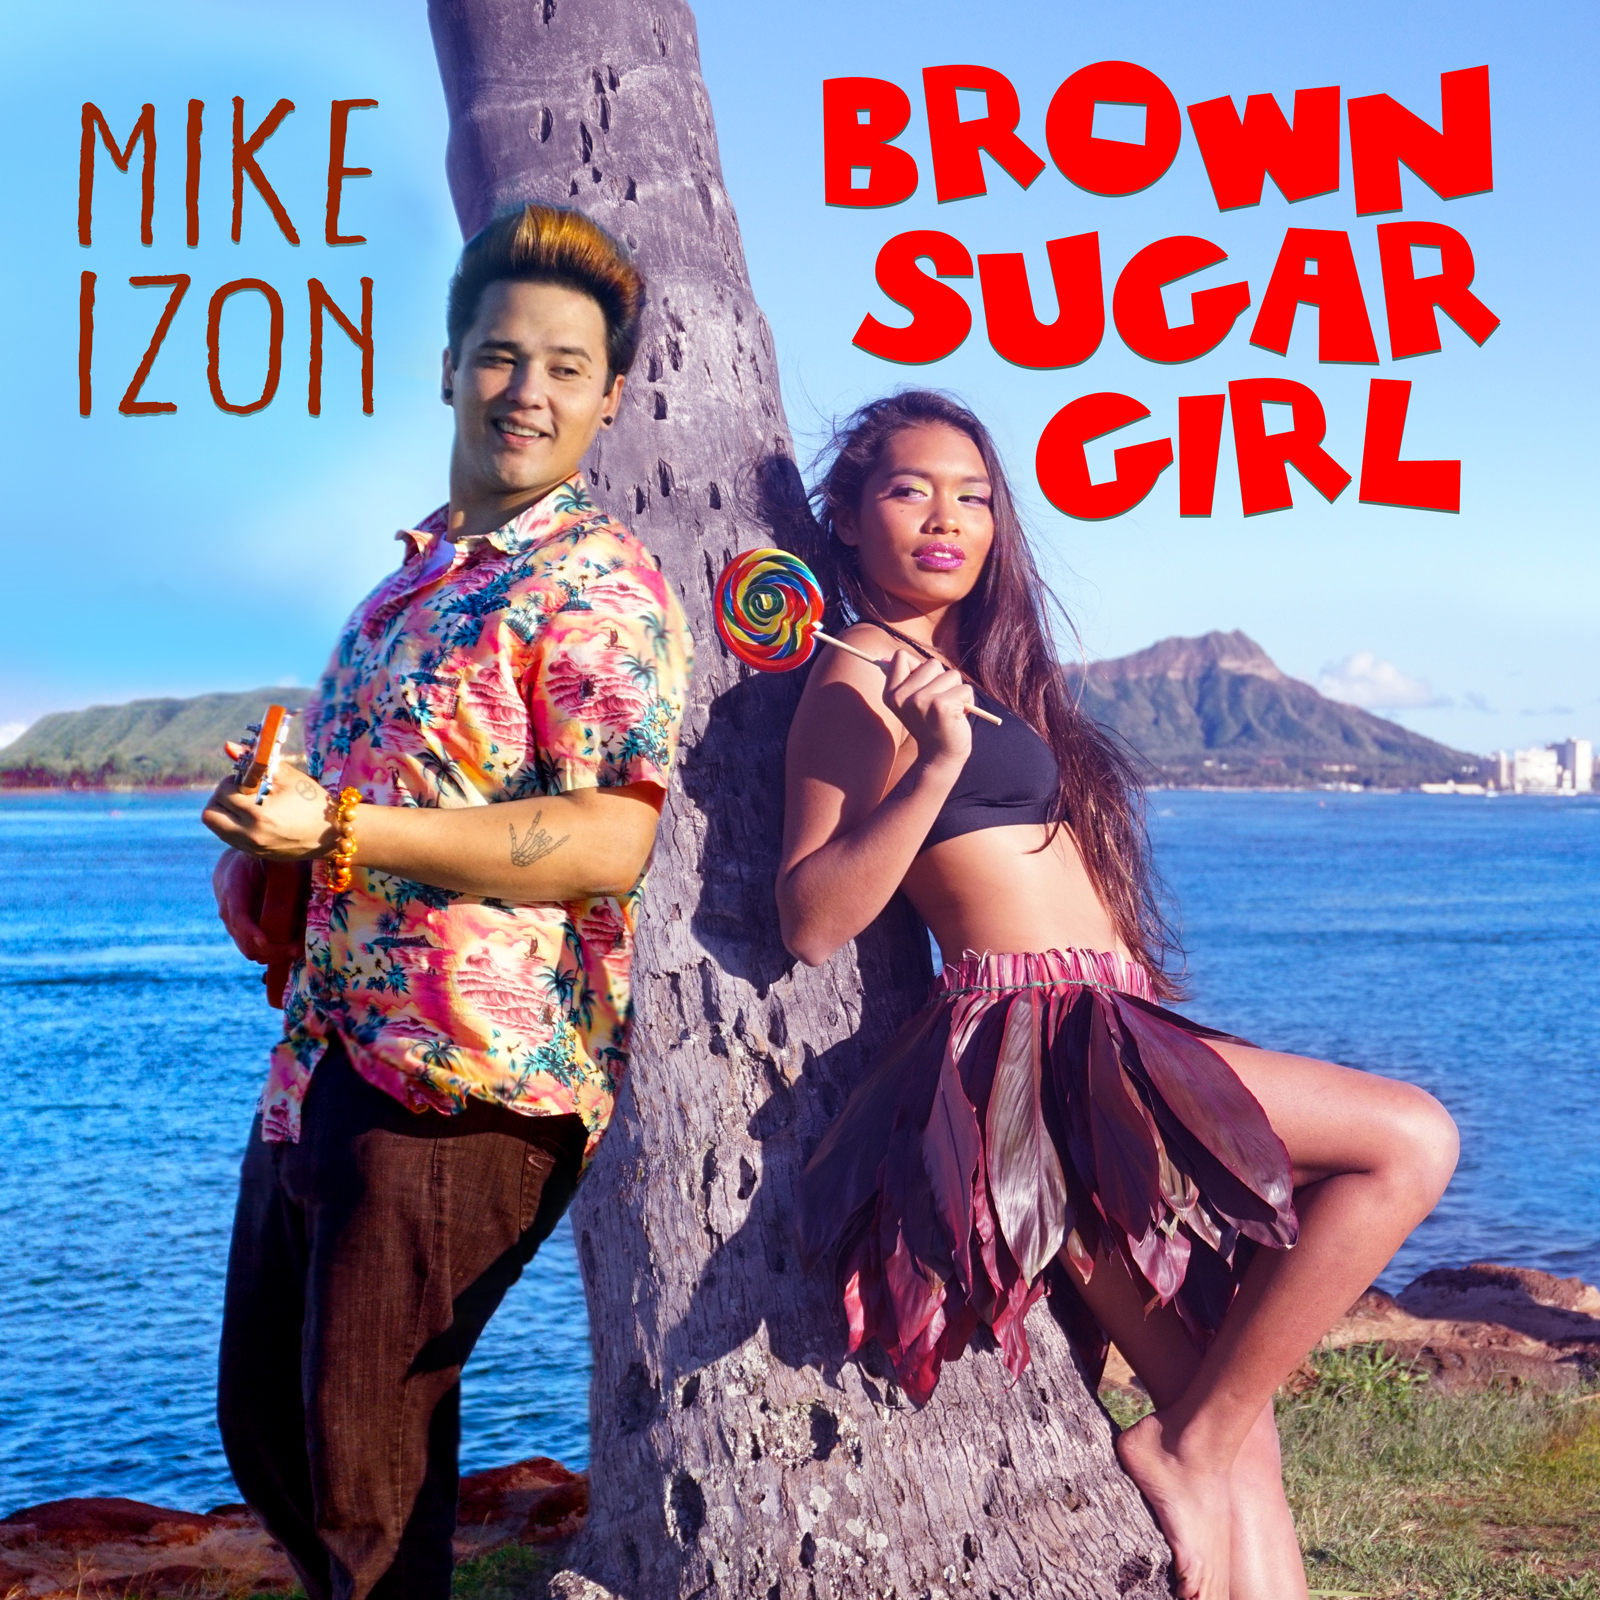 Brown Sugar Girl Release date: May 19, 2019